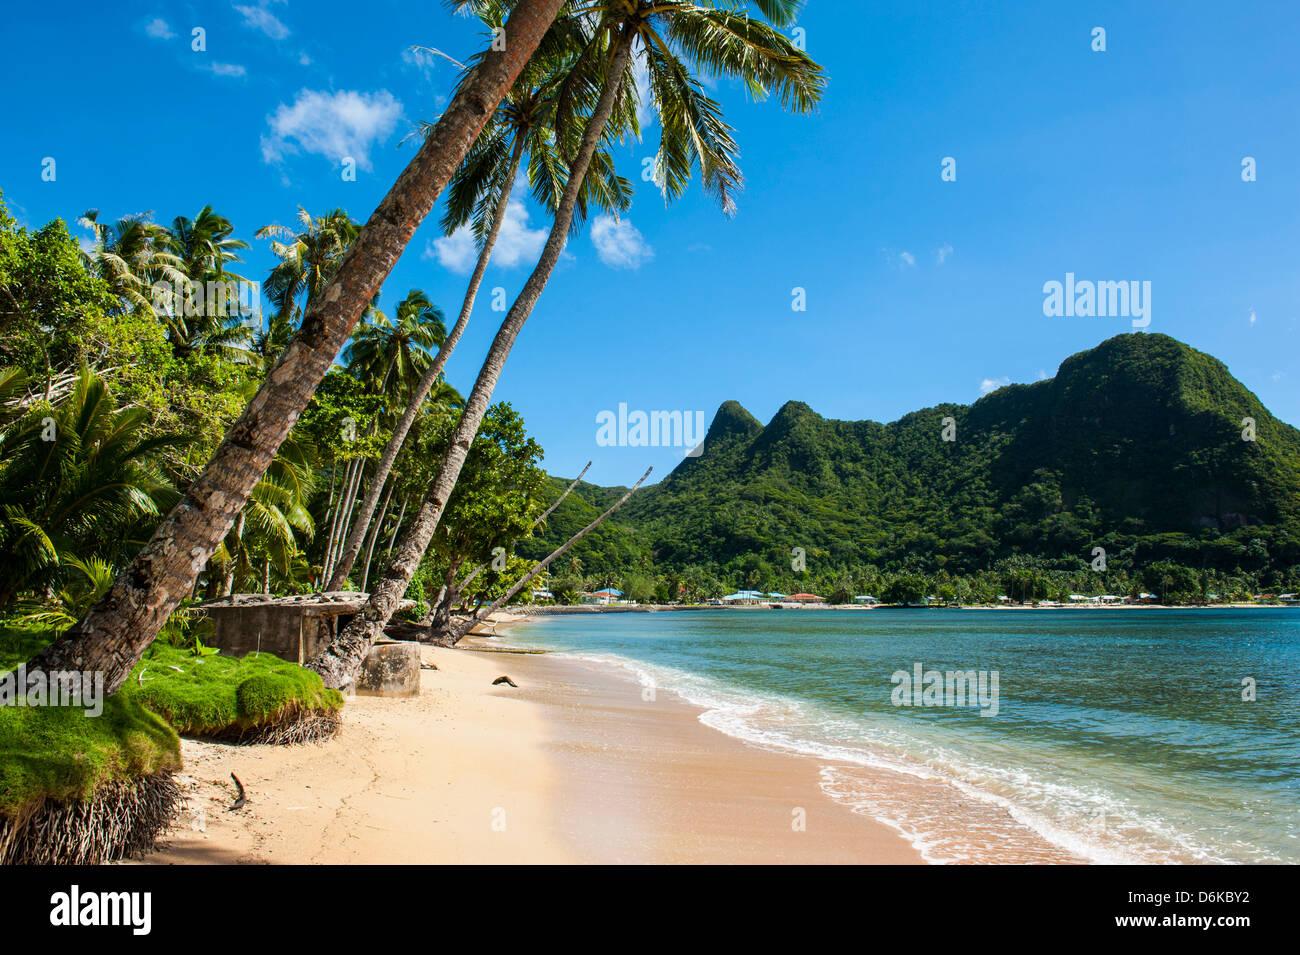 National Park of American Samoa, Tutuila Island, American Samoa, South Pacific, Pacific - Stock Image